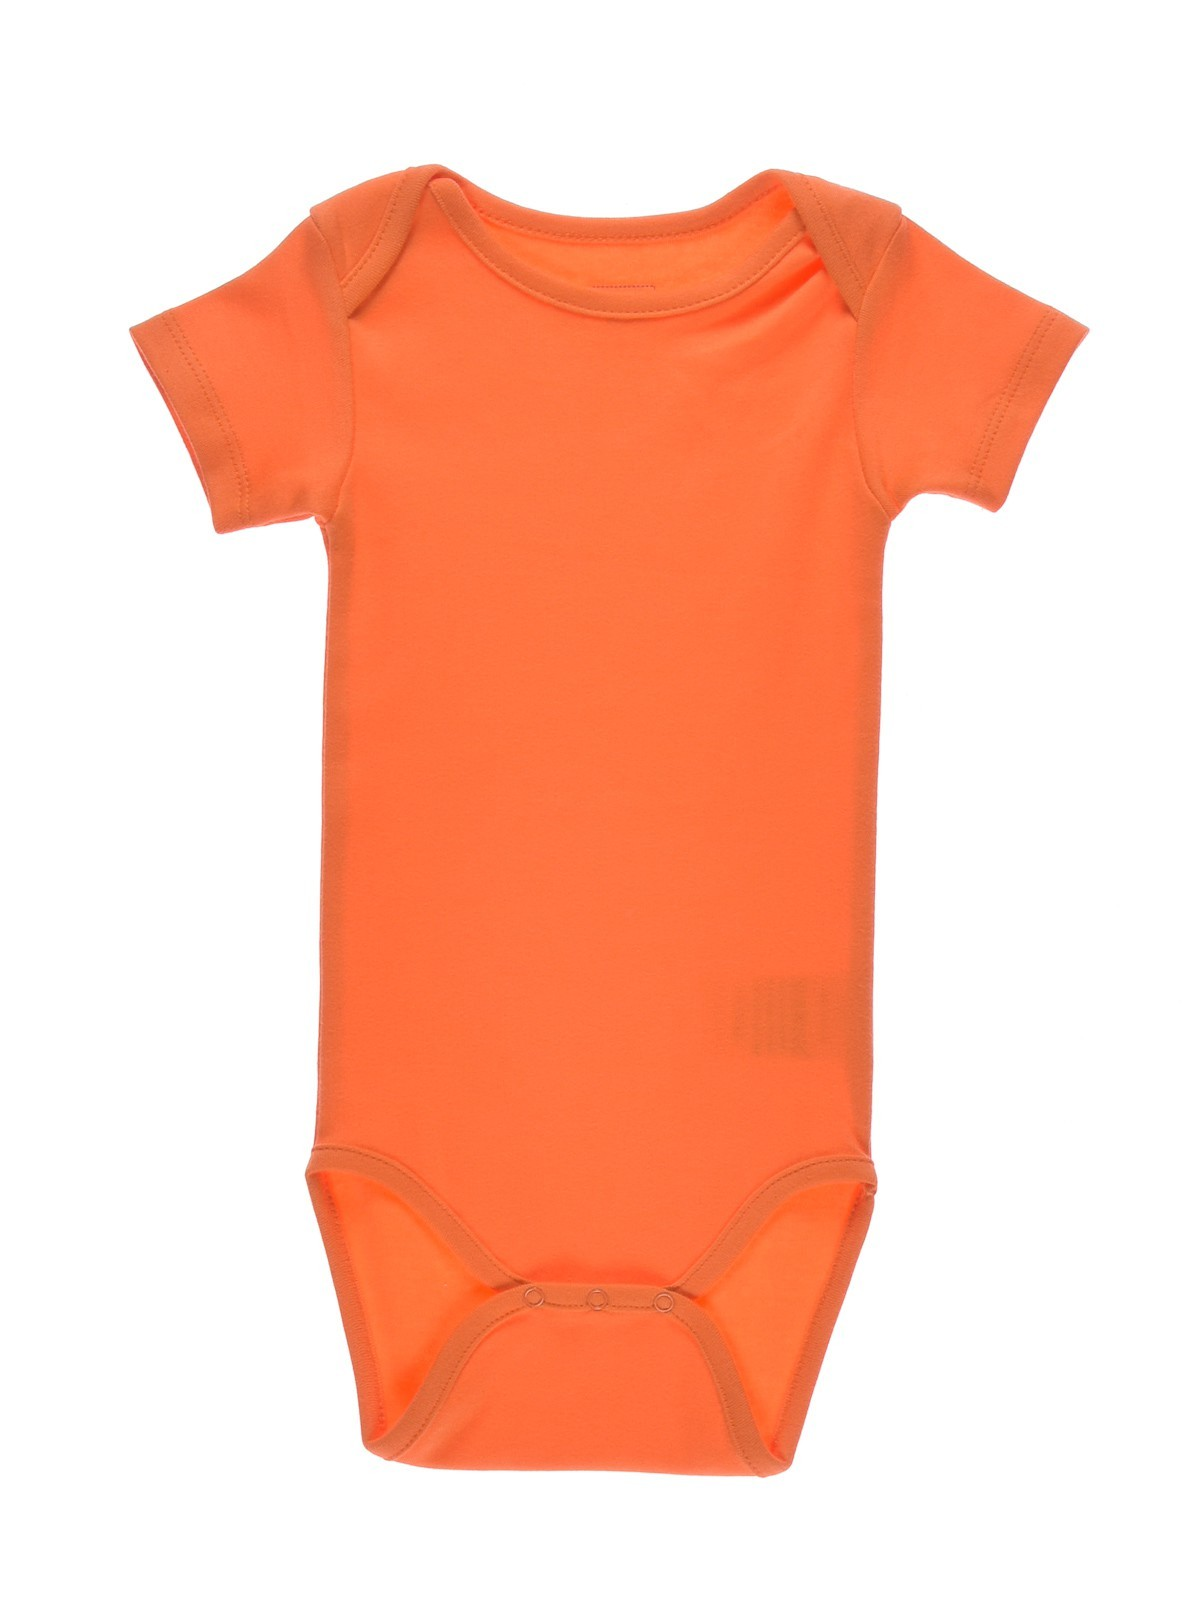 Body garçon orange bébé garçon (3-24M) - DistriCenter 6858fb9fd93